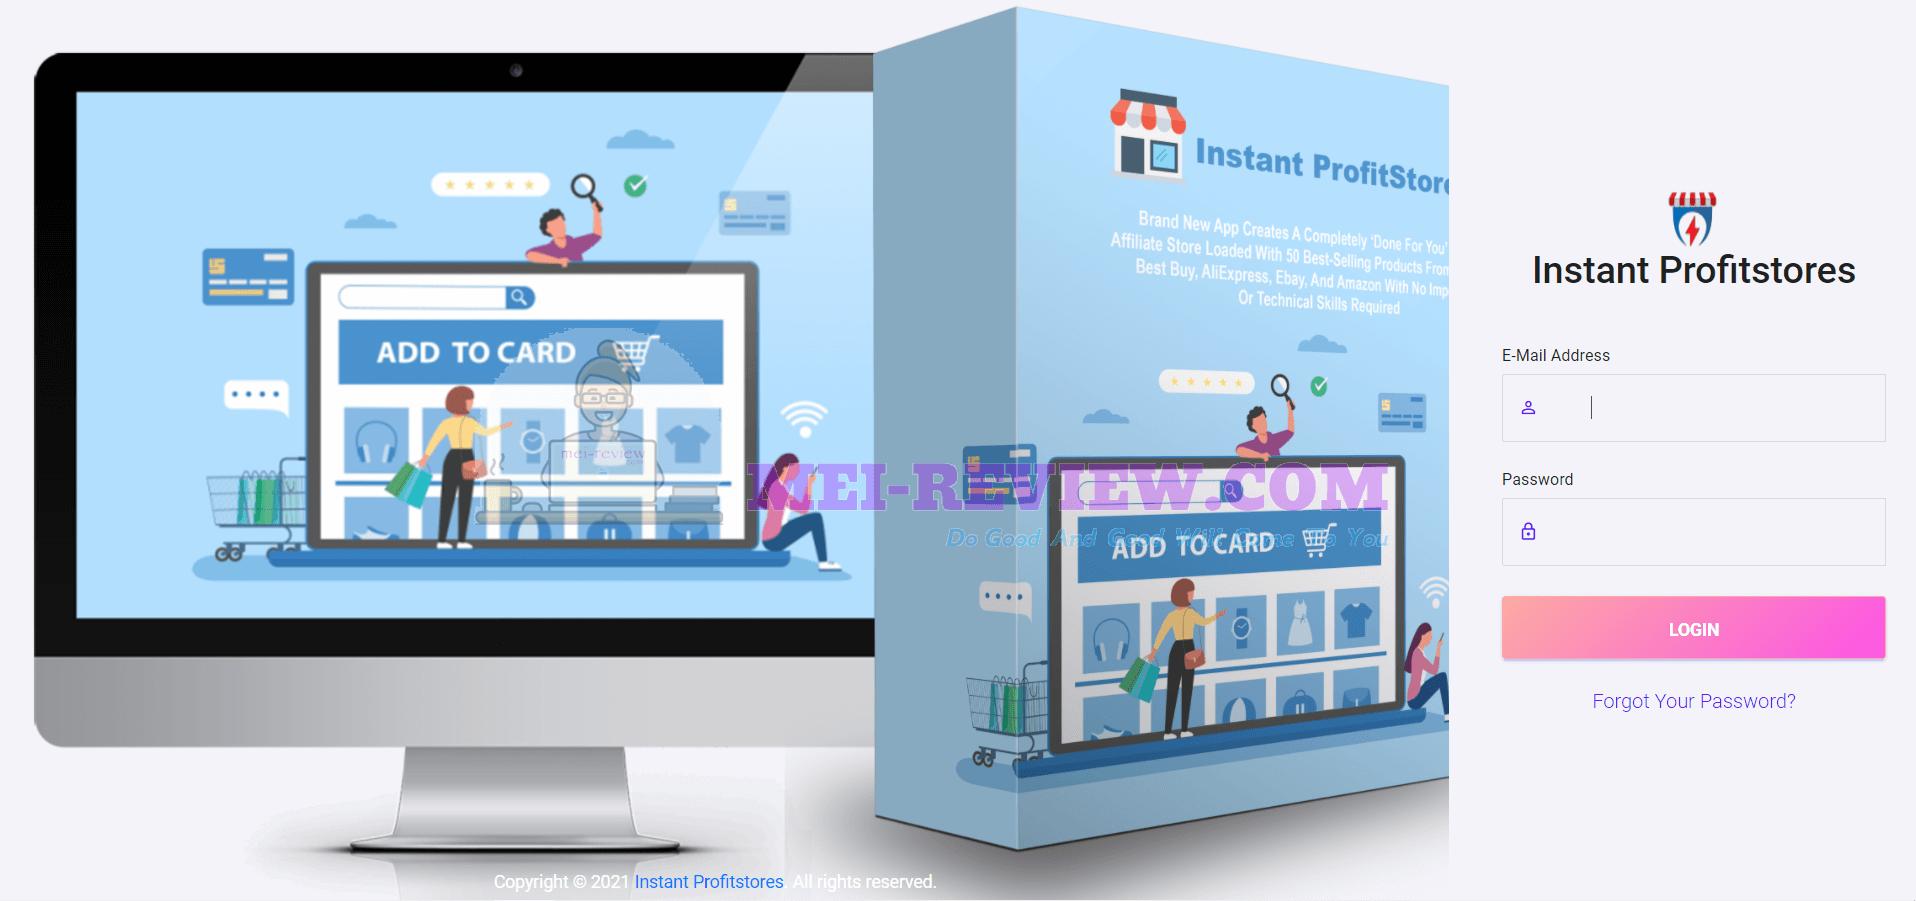 Instant-Profitstores-cloud-based-app